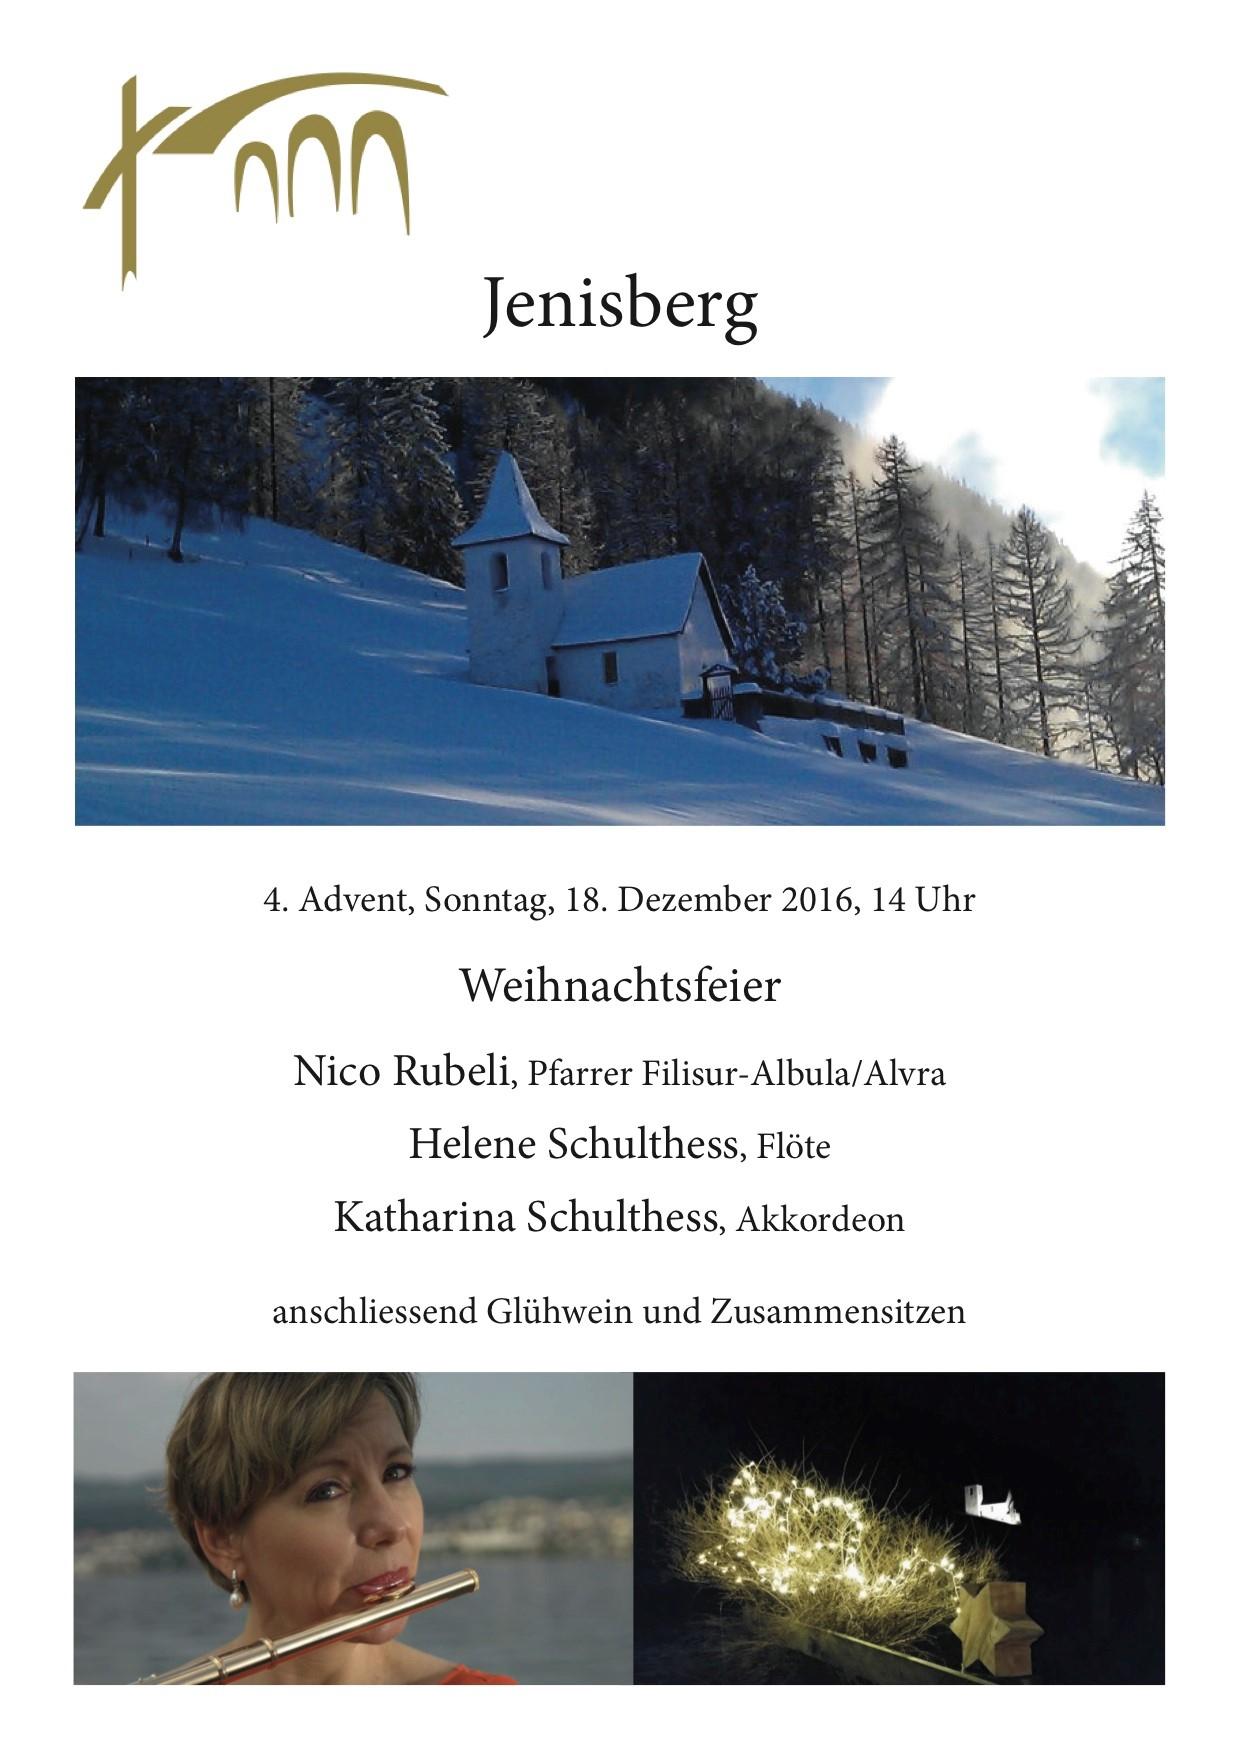 Weihnachtsfeier Jenisberg